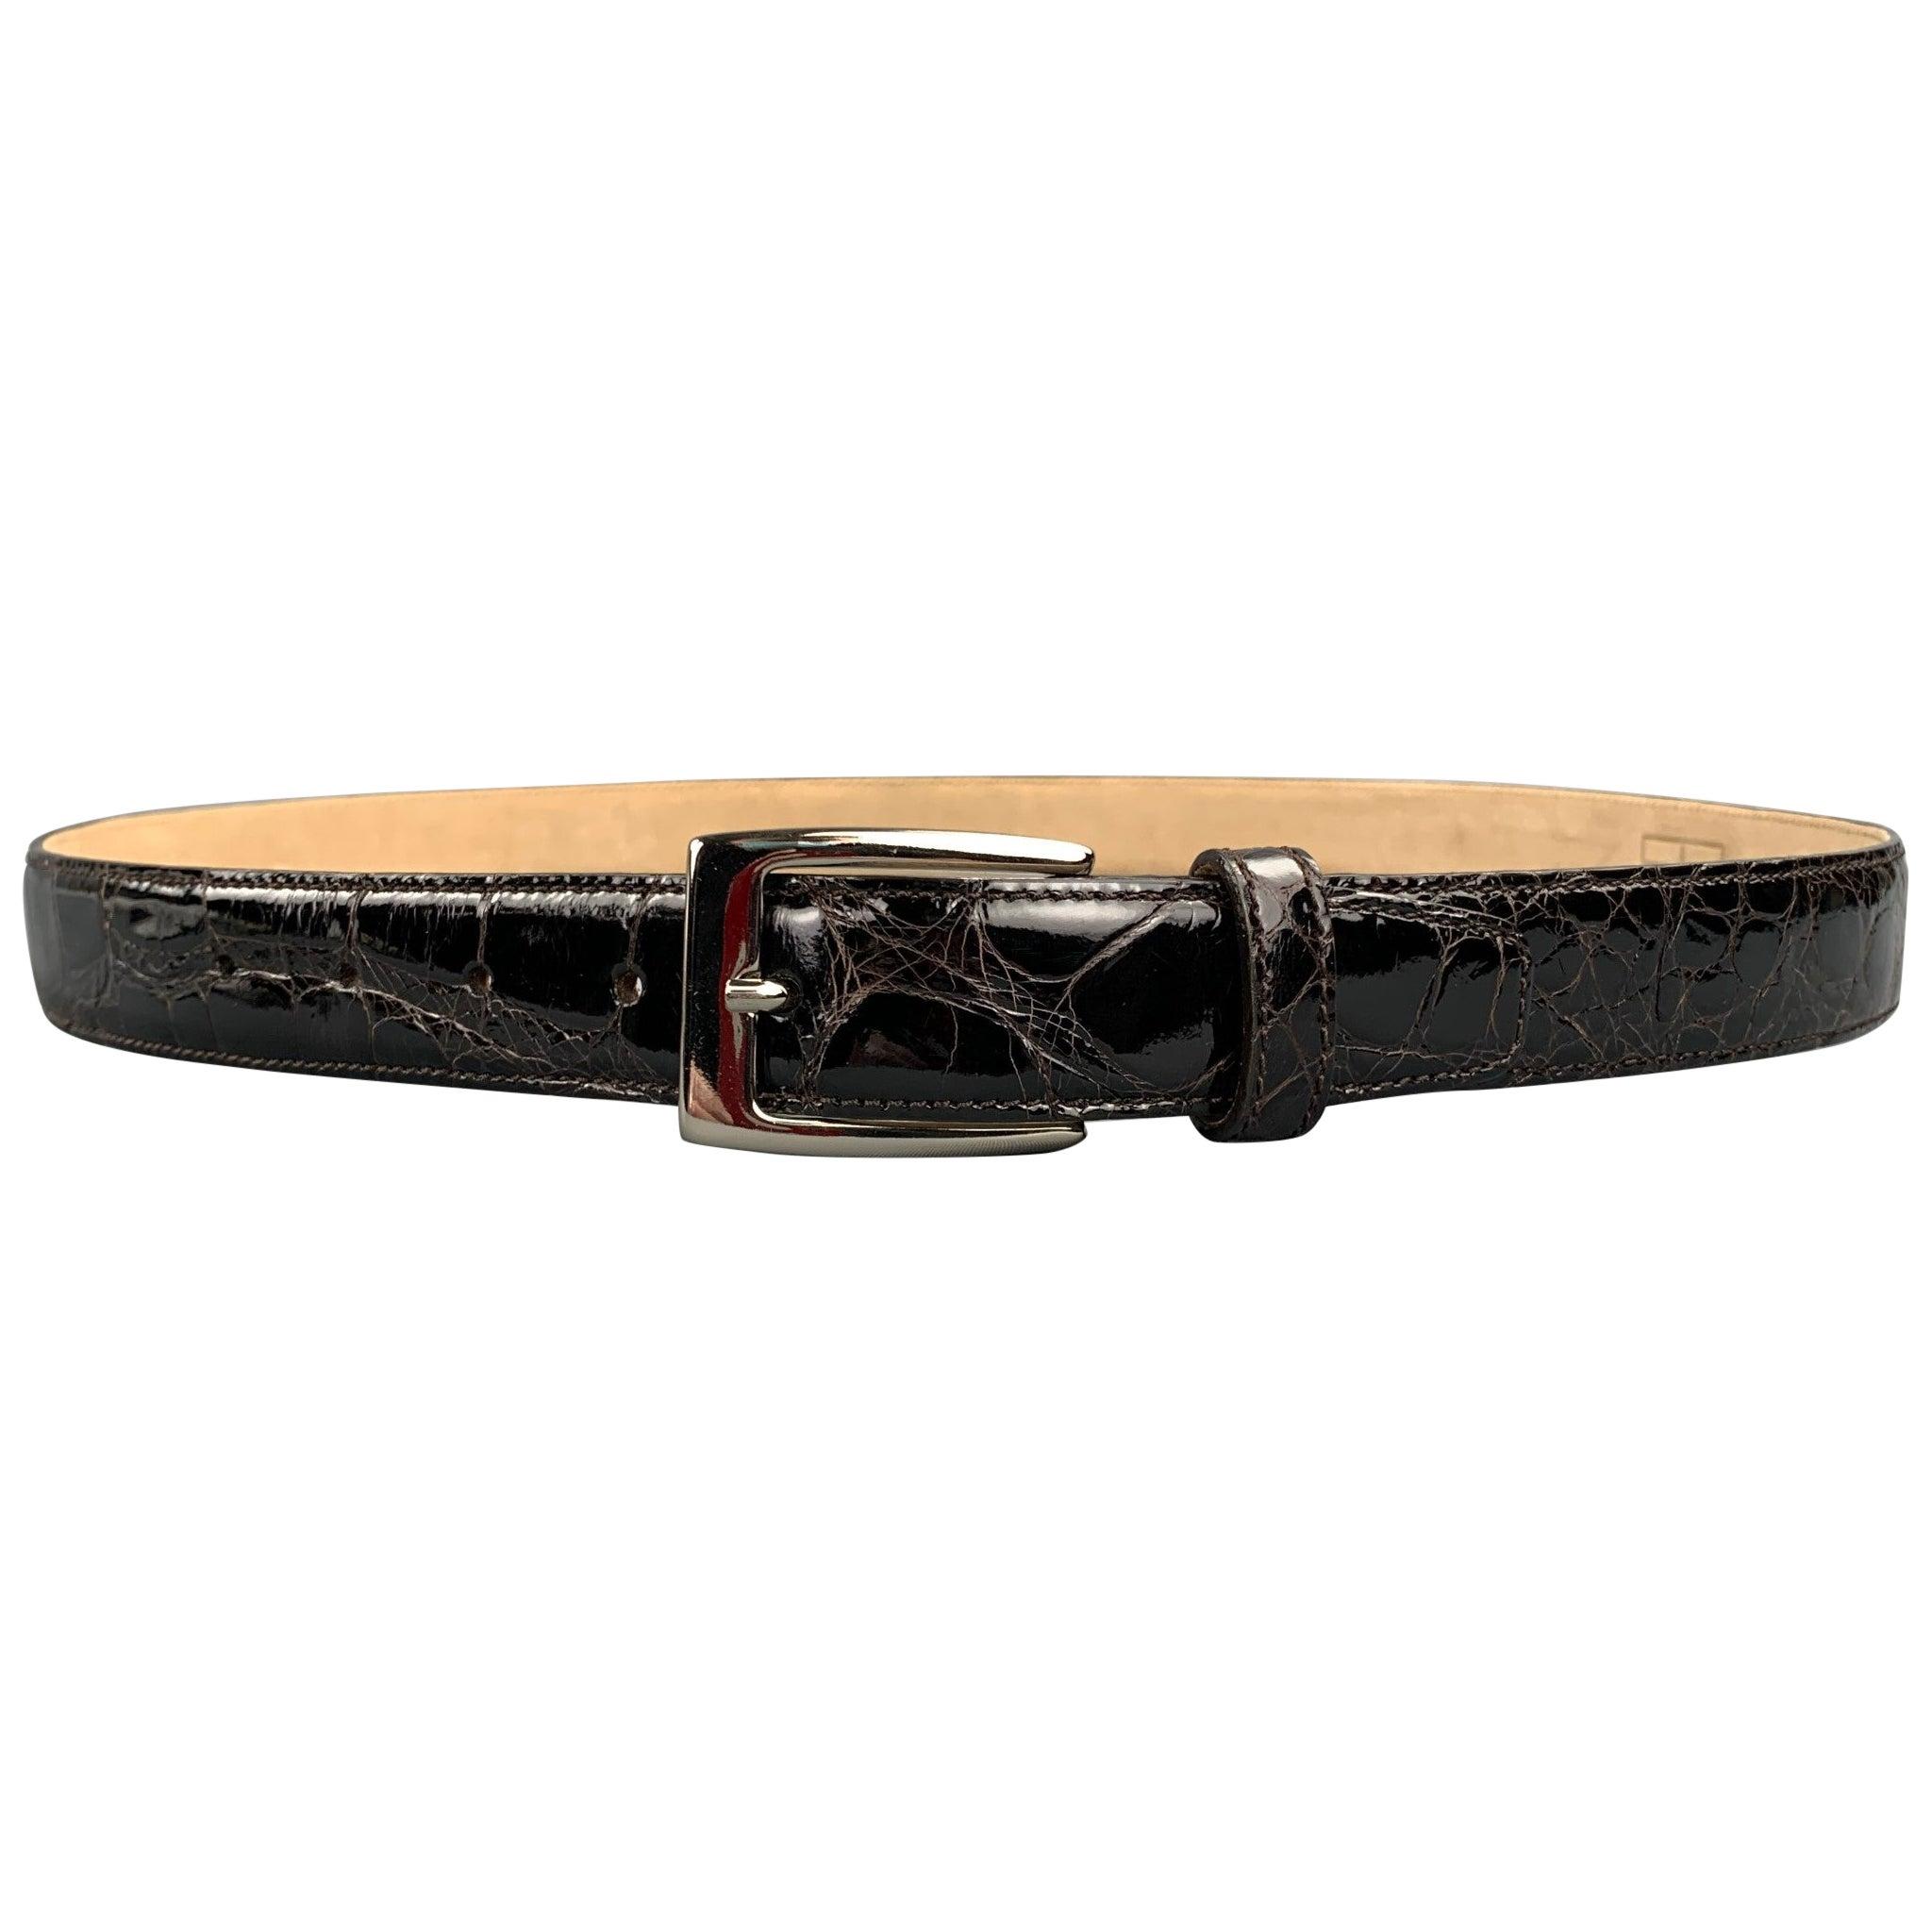 TARDINI Size 40 Black Textured Alligator Leather Belt